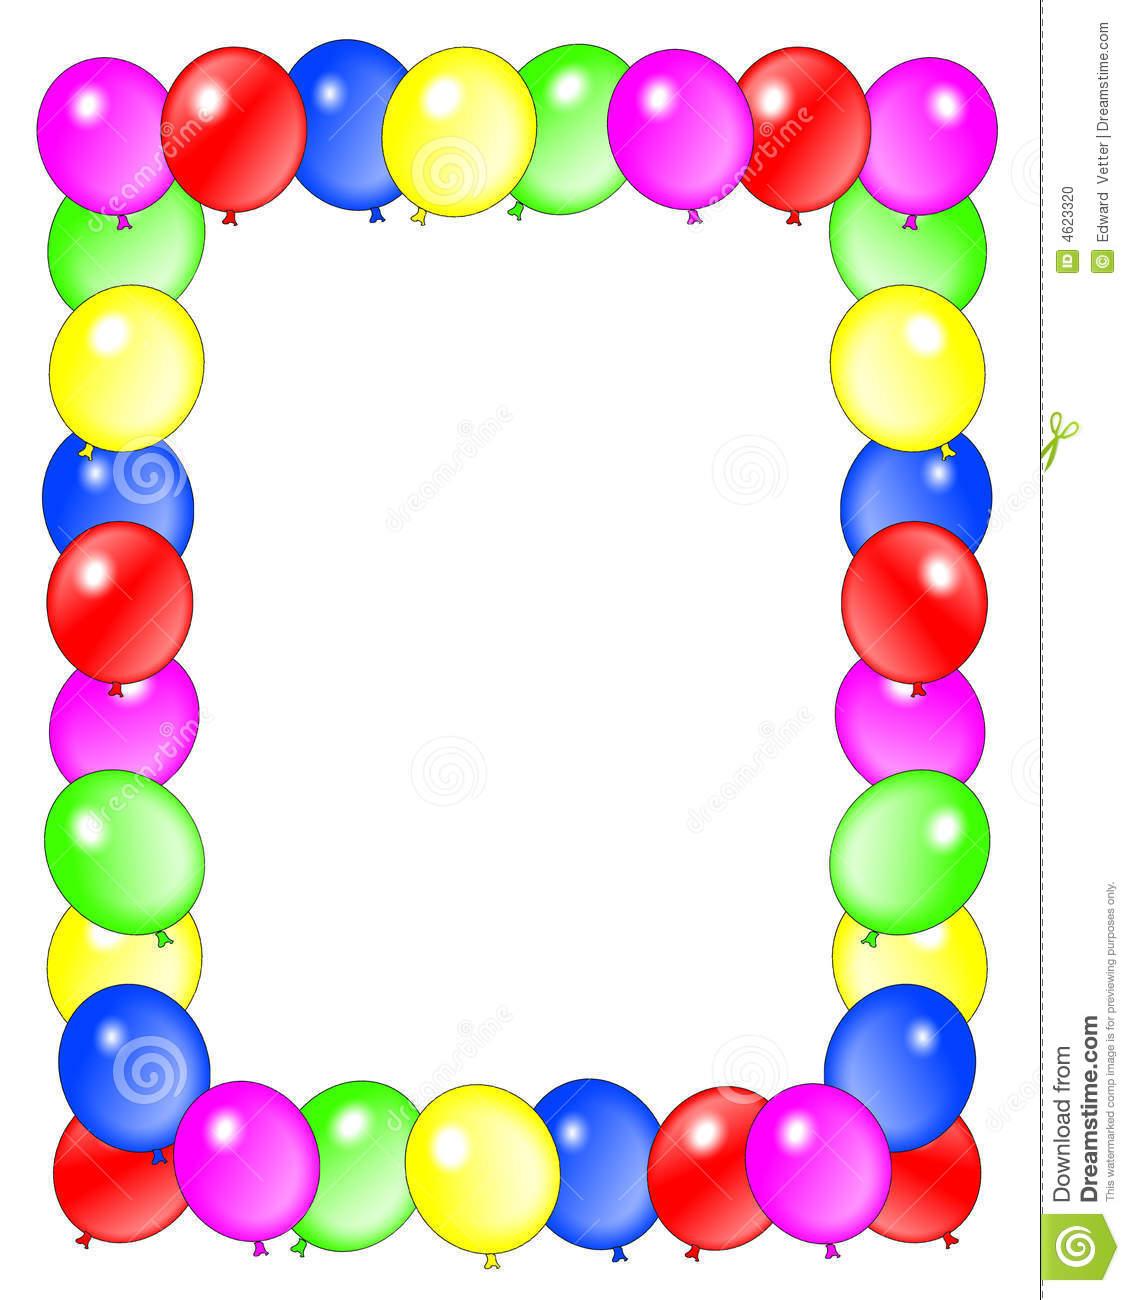 Free Birthday Balloon Clipart | Free download best Free Birthday ...